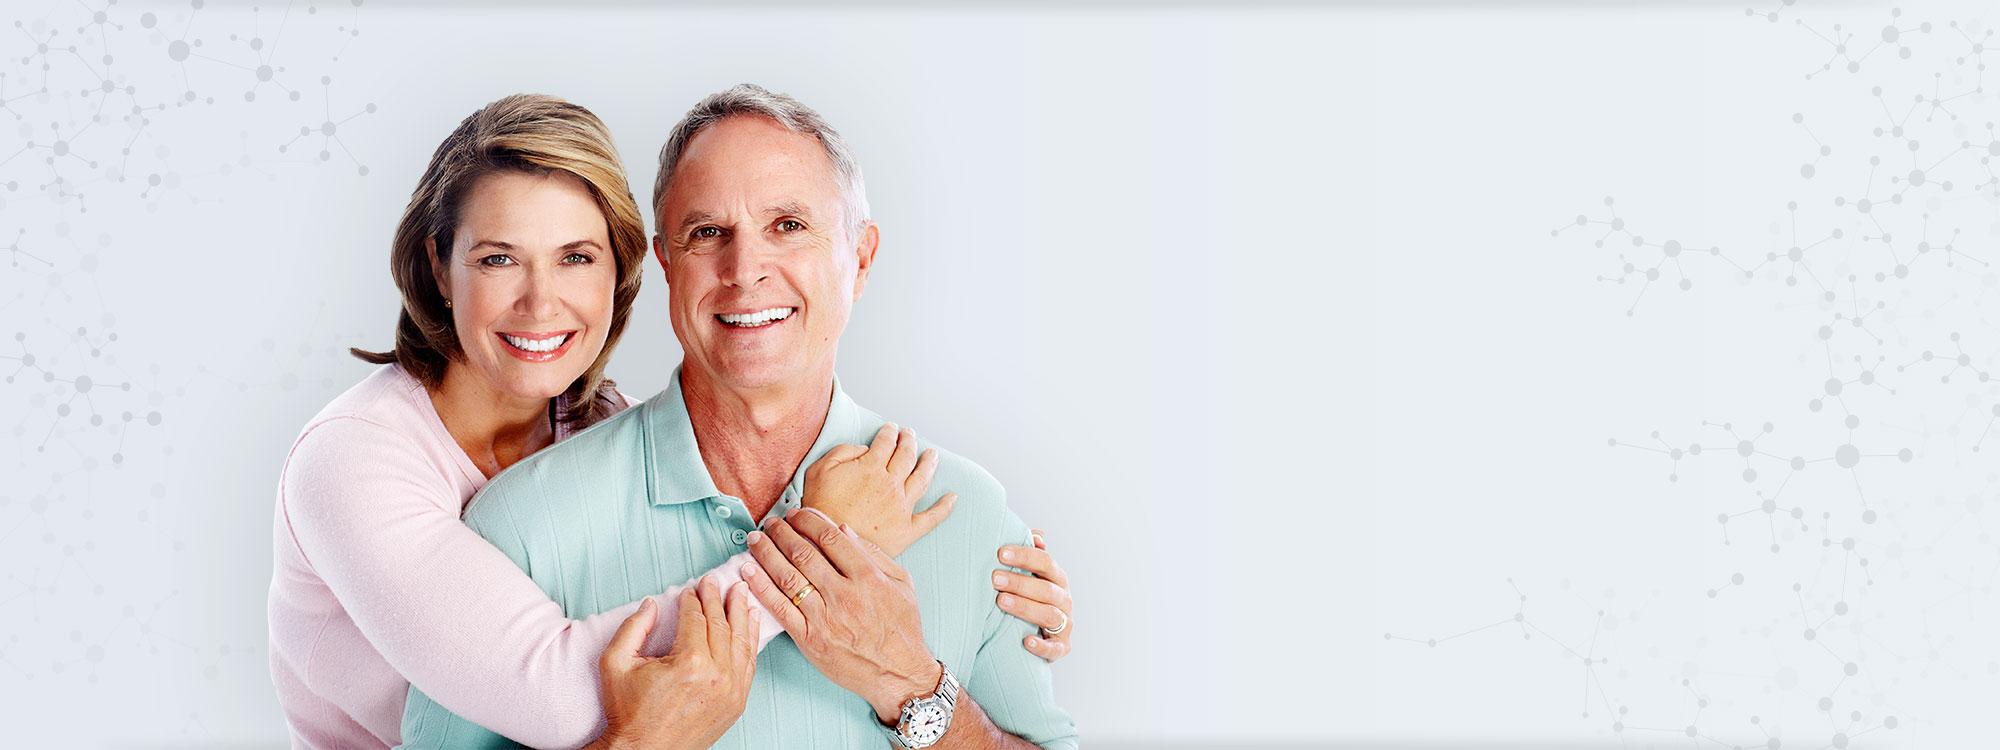 Implantalogen auf implant24.com finden